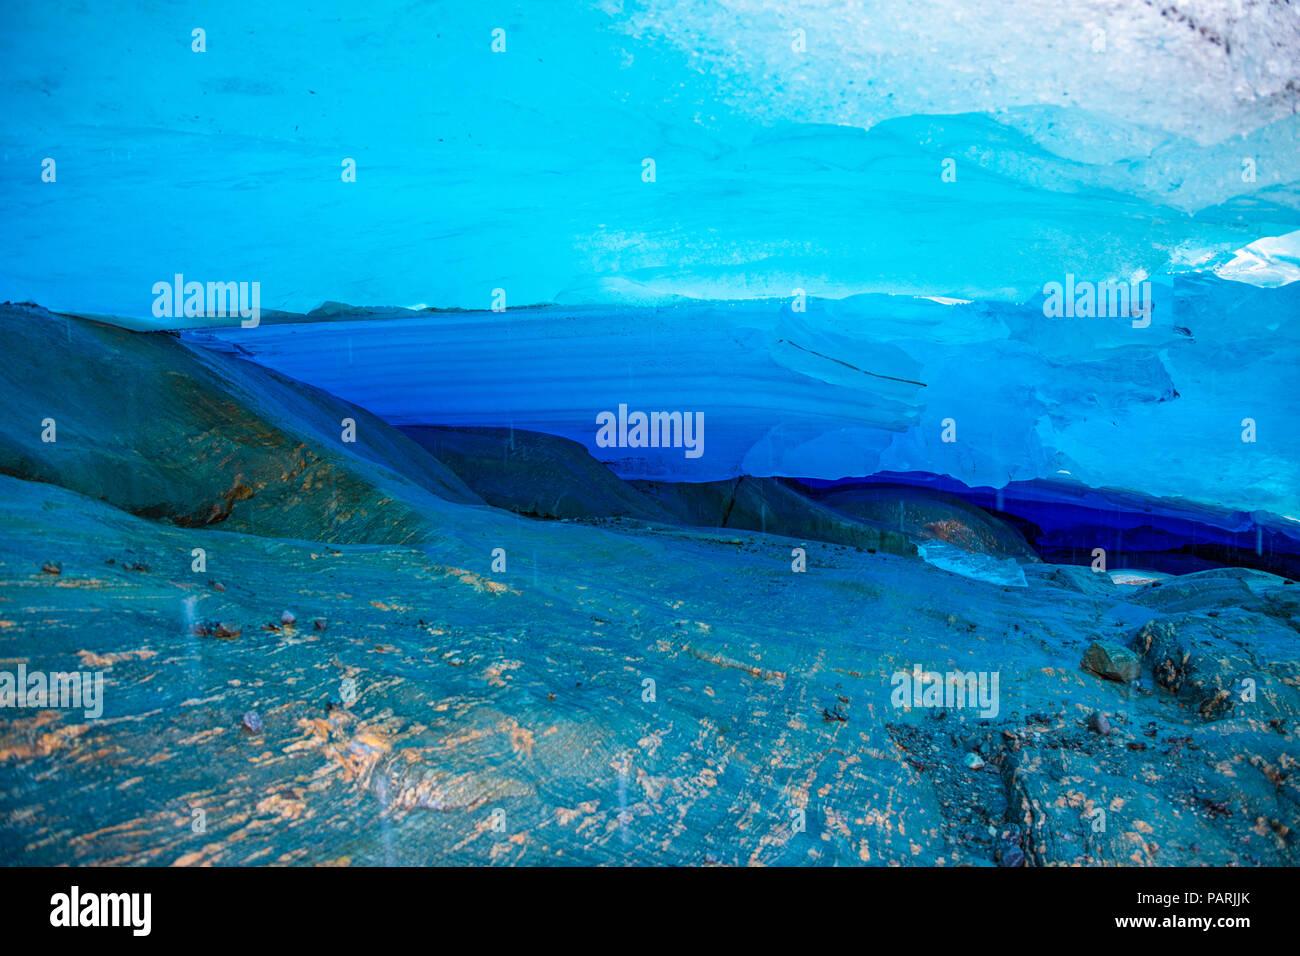 Blue Ice Cave der Svartisen-gletscher, Norwegen Stockbild